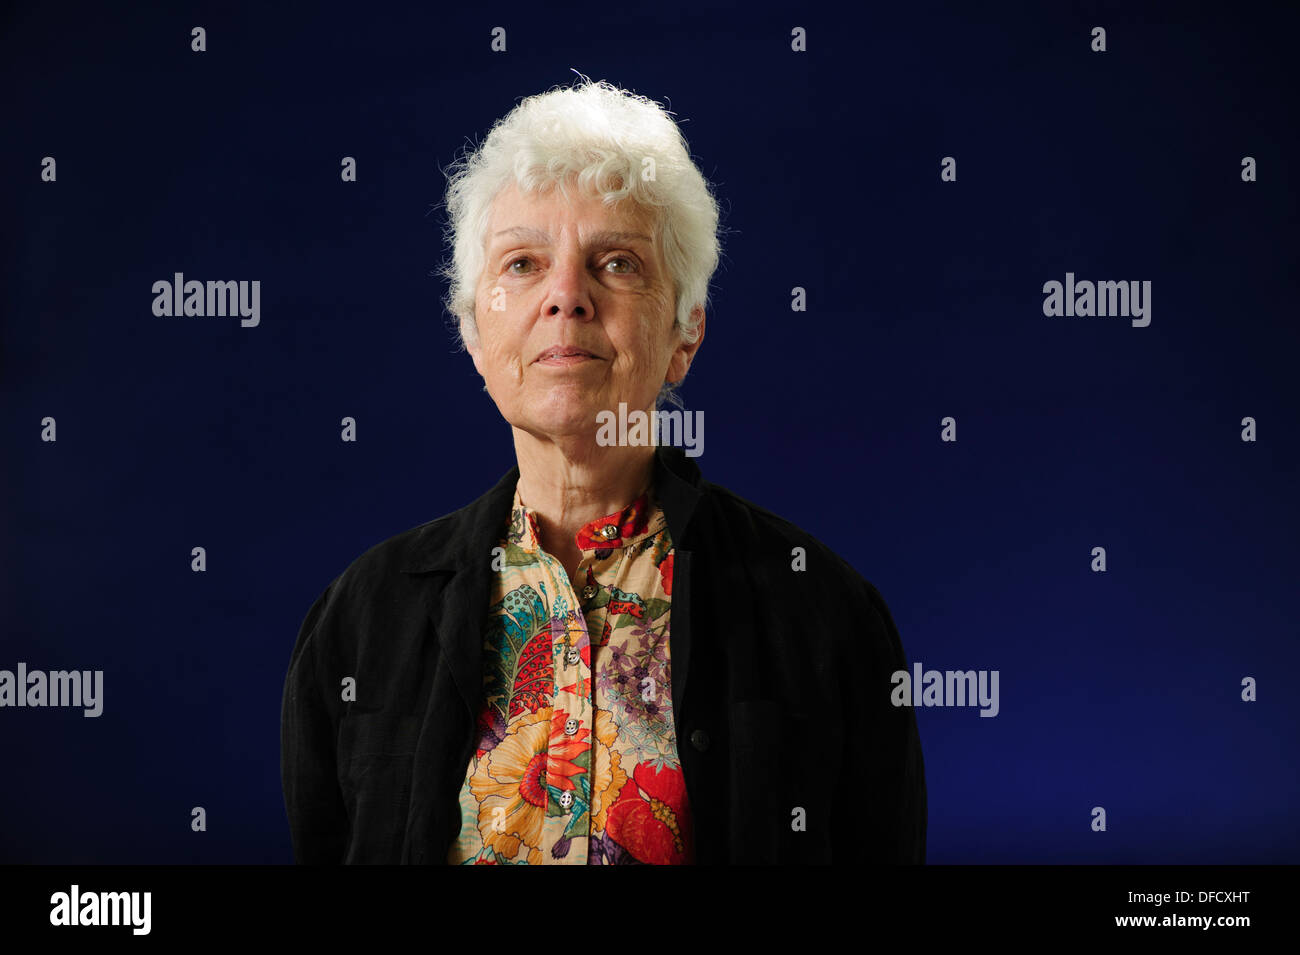 Jenni Calder, Scottish literary historian and arts establishment figure, attending at the Edinburgh International Book Festival - Stock Image